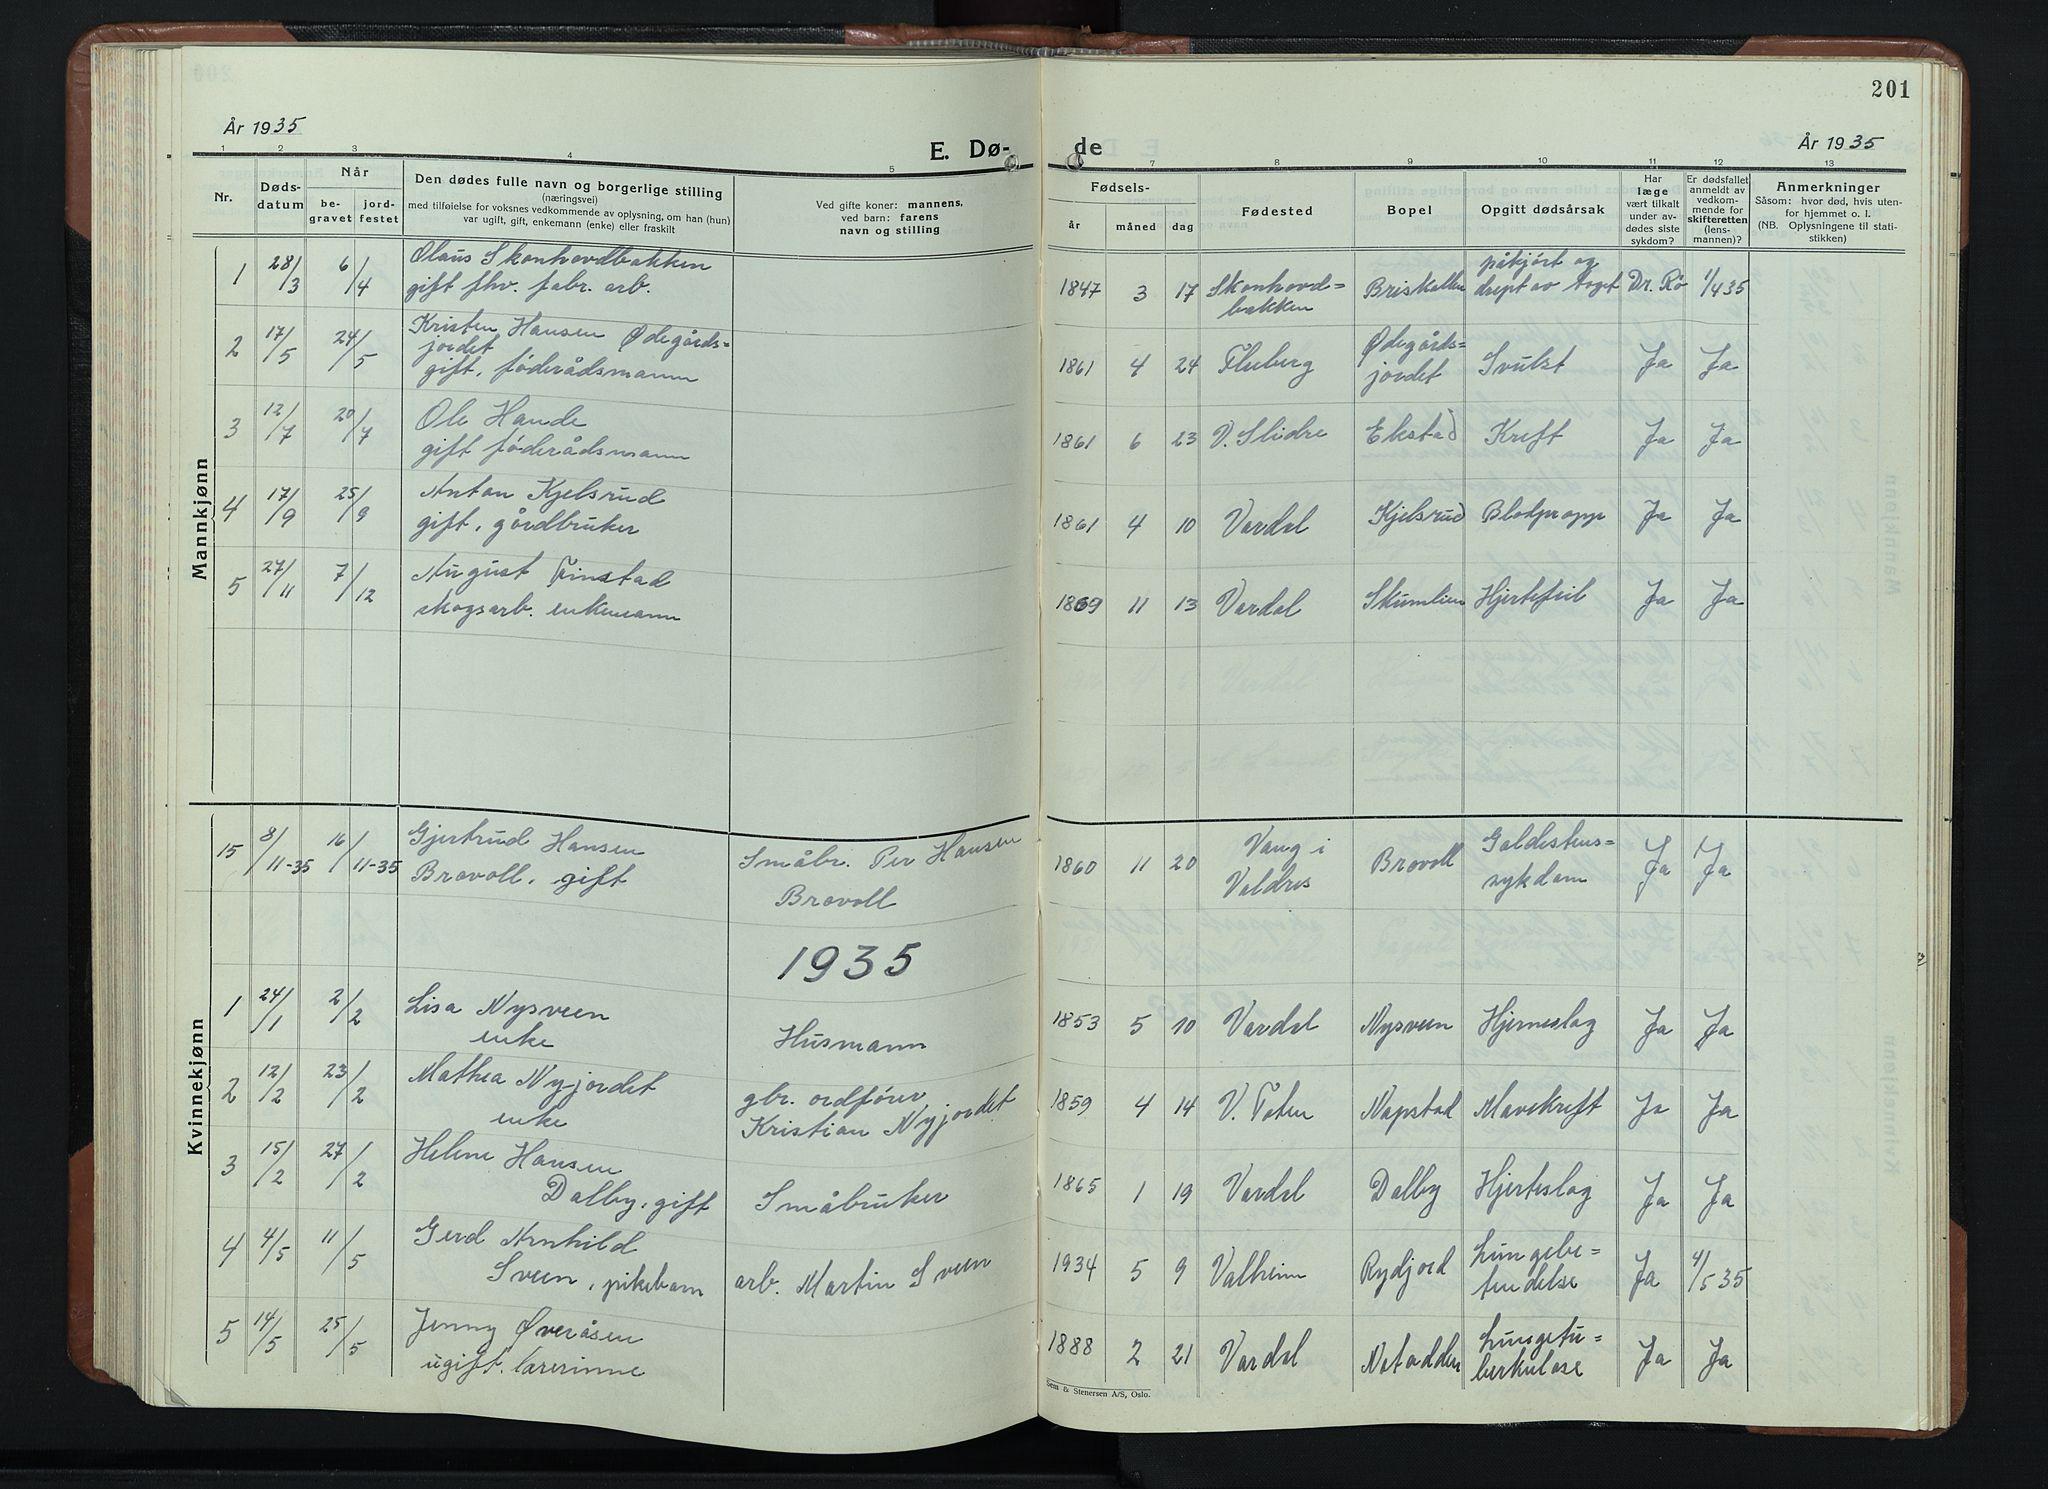 SAH, Vardal prestekontor, H/Ha/Hab/L0018: Klokkerbok nr. 18, 1931-1951, s. 201